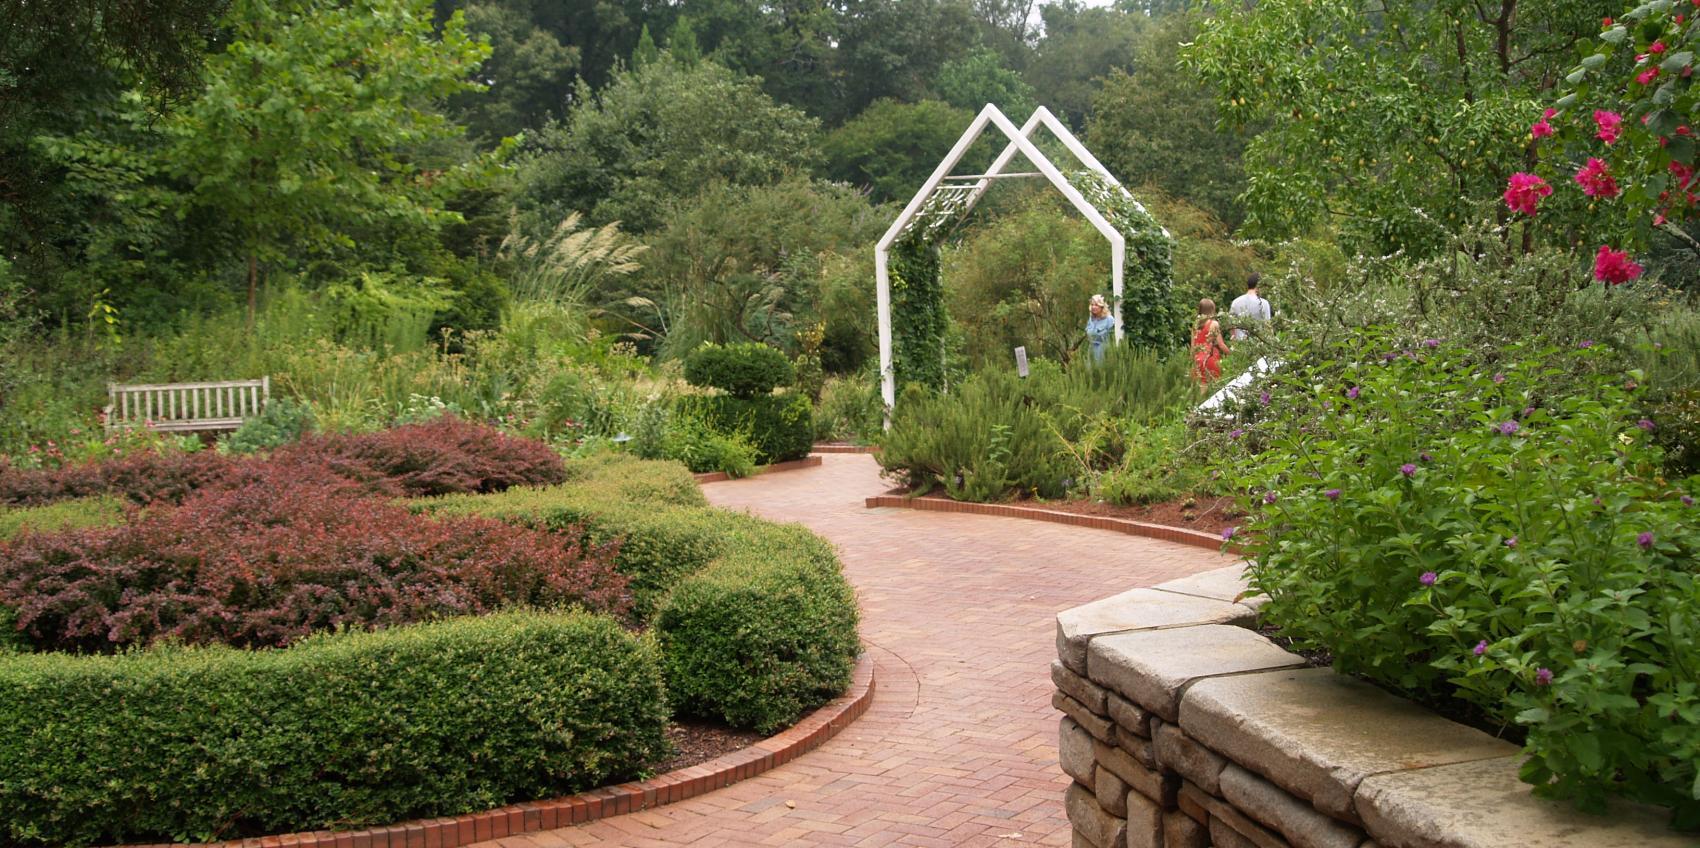 State Botanical Garden Of Georgia American Public Gardens Association